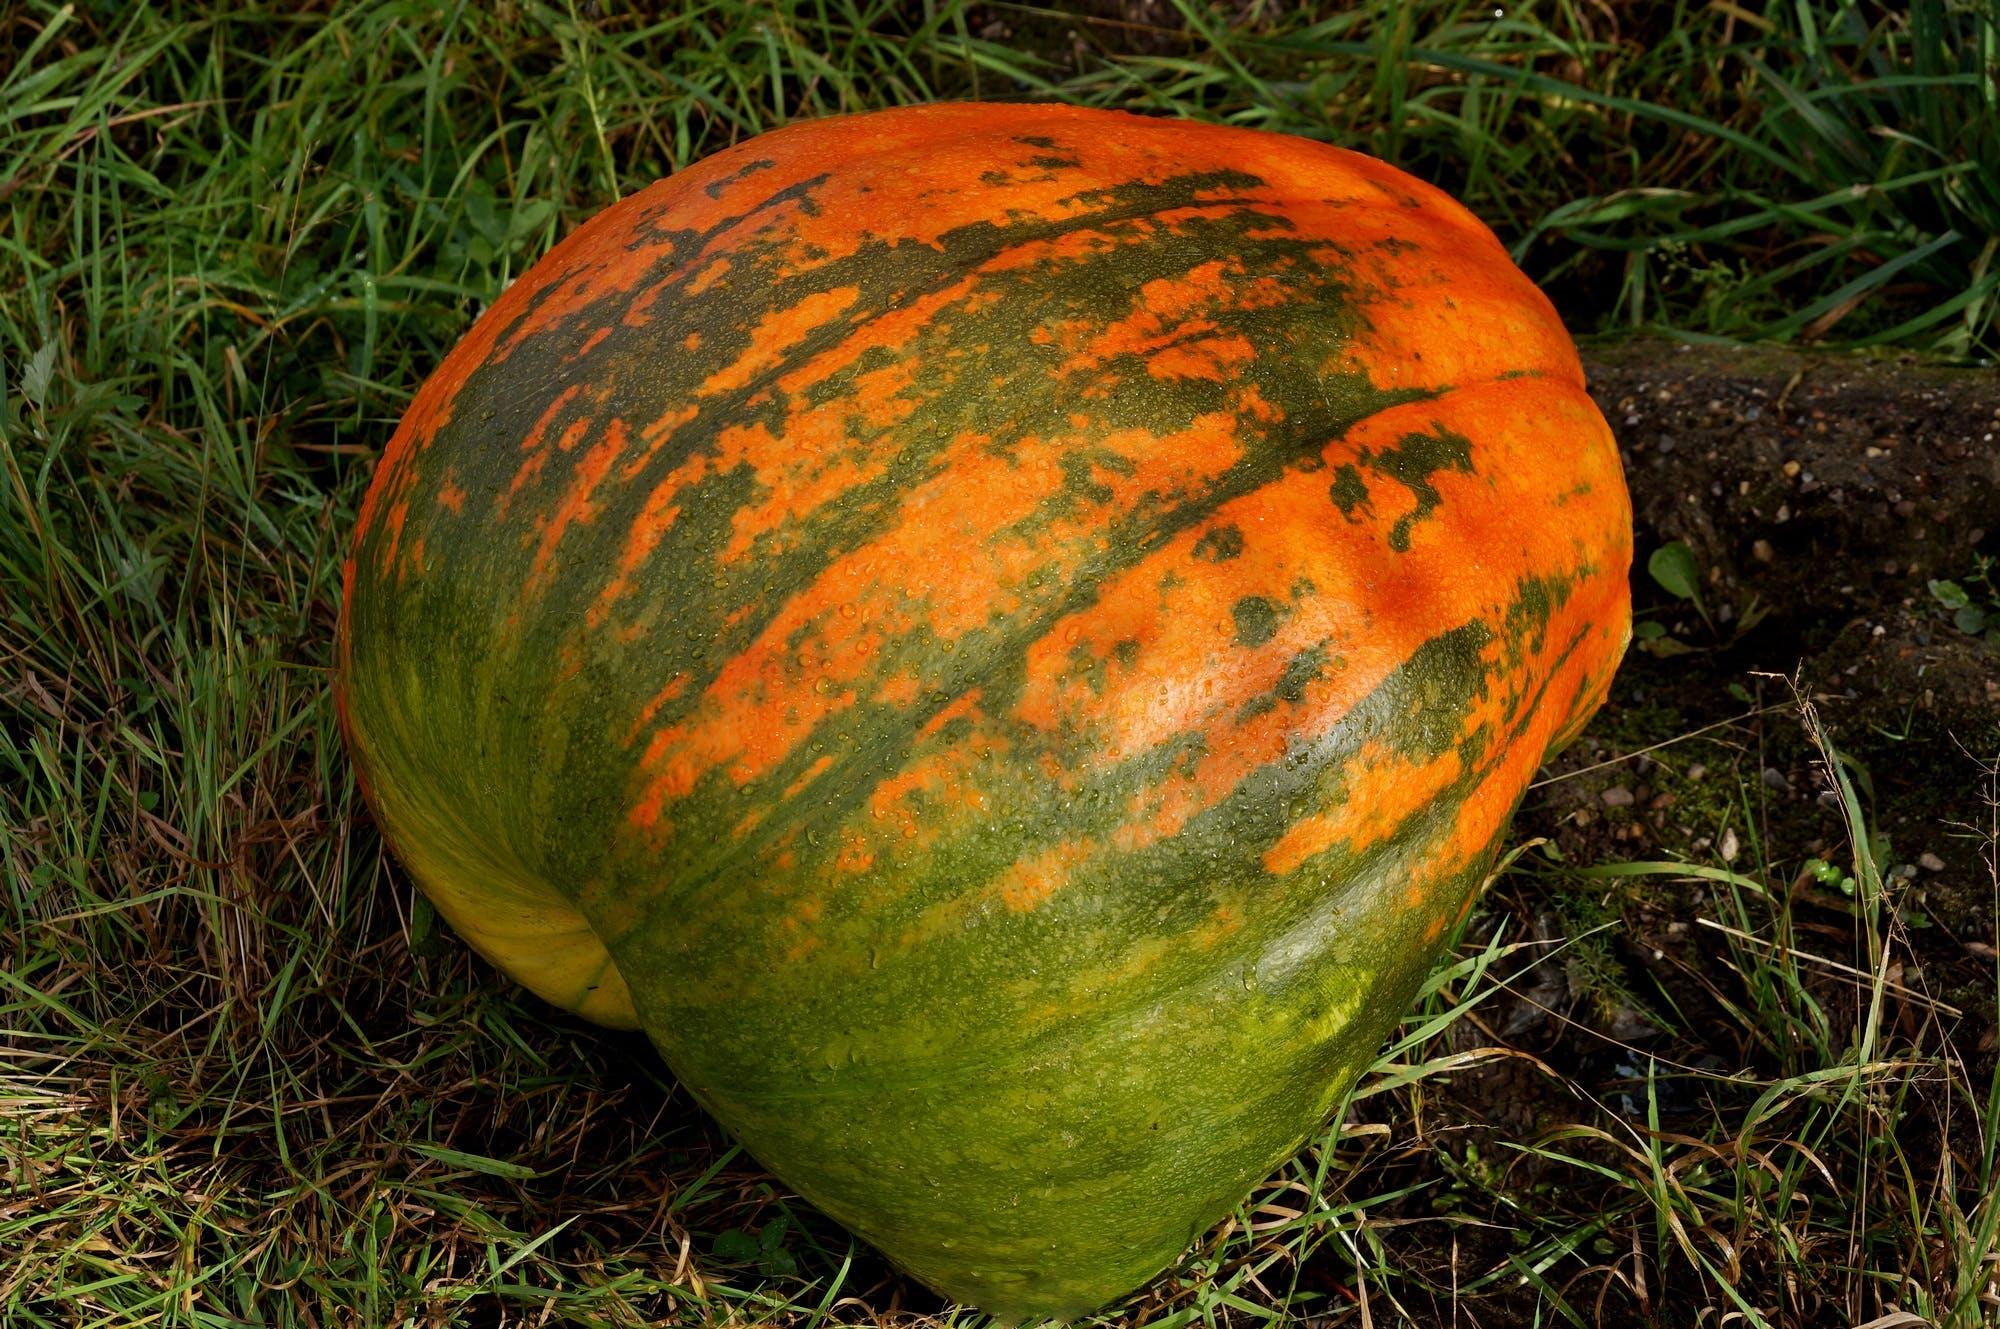 Free stock photo of food, vegetables, harvest, autumn